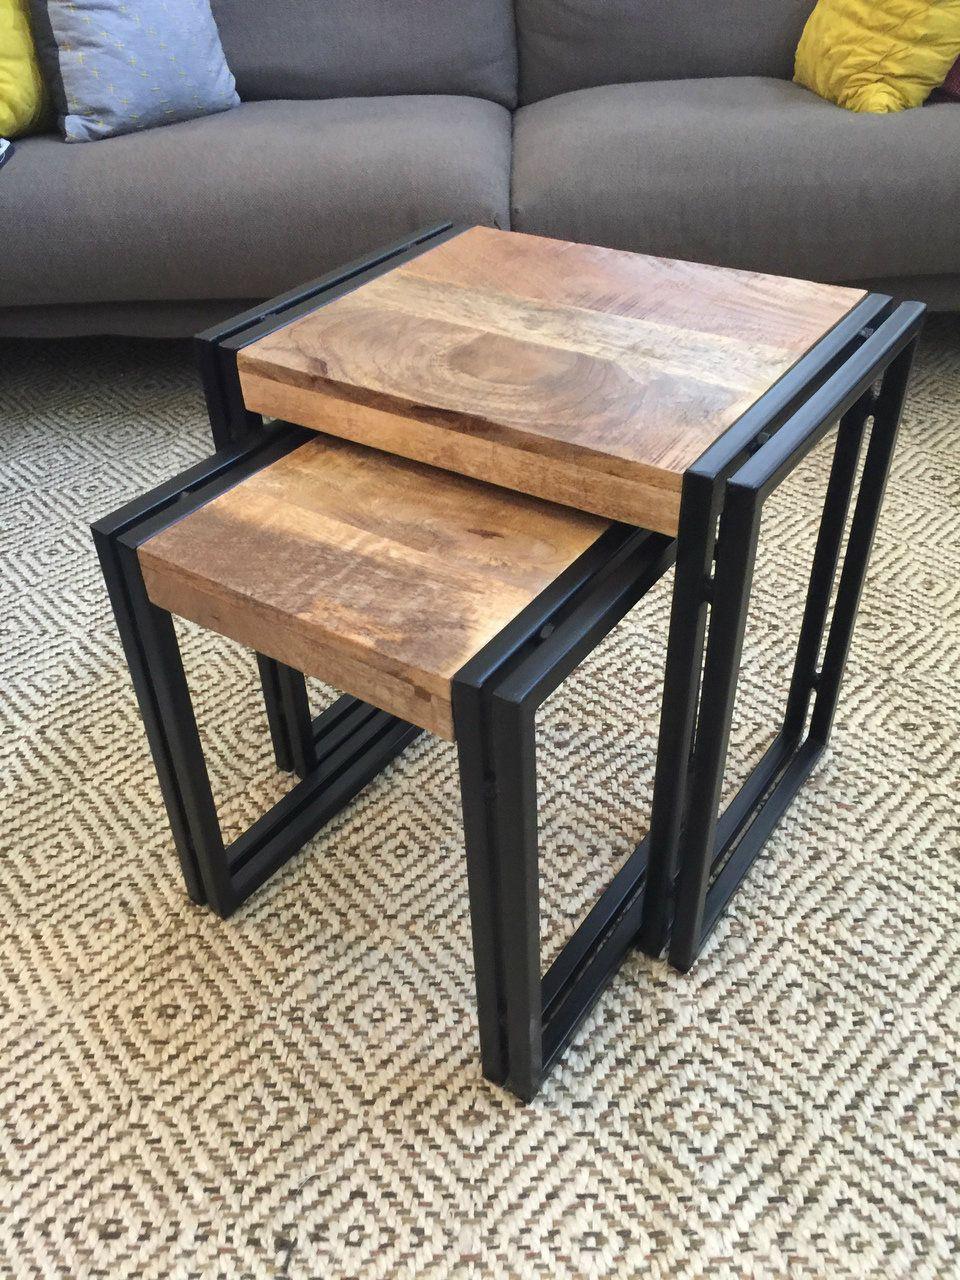 Reclaimed Wood Metal Nesting Table Set Of 2 Metal Nesting Tables Nesting Tables Table [ 1280 x 960 Pixel ]